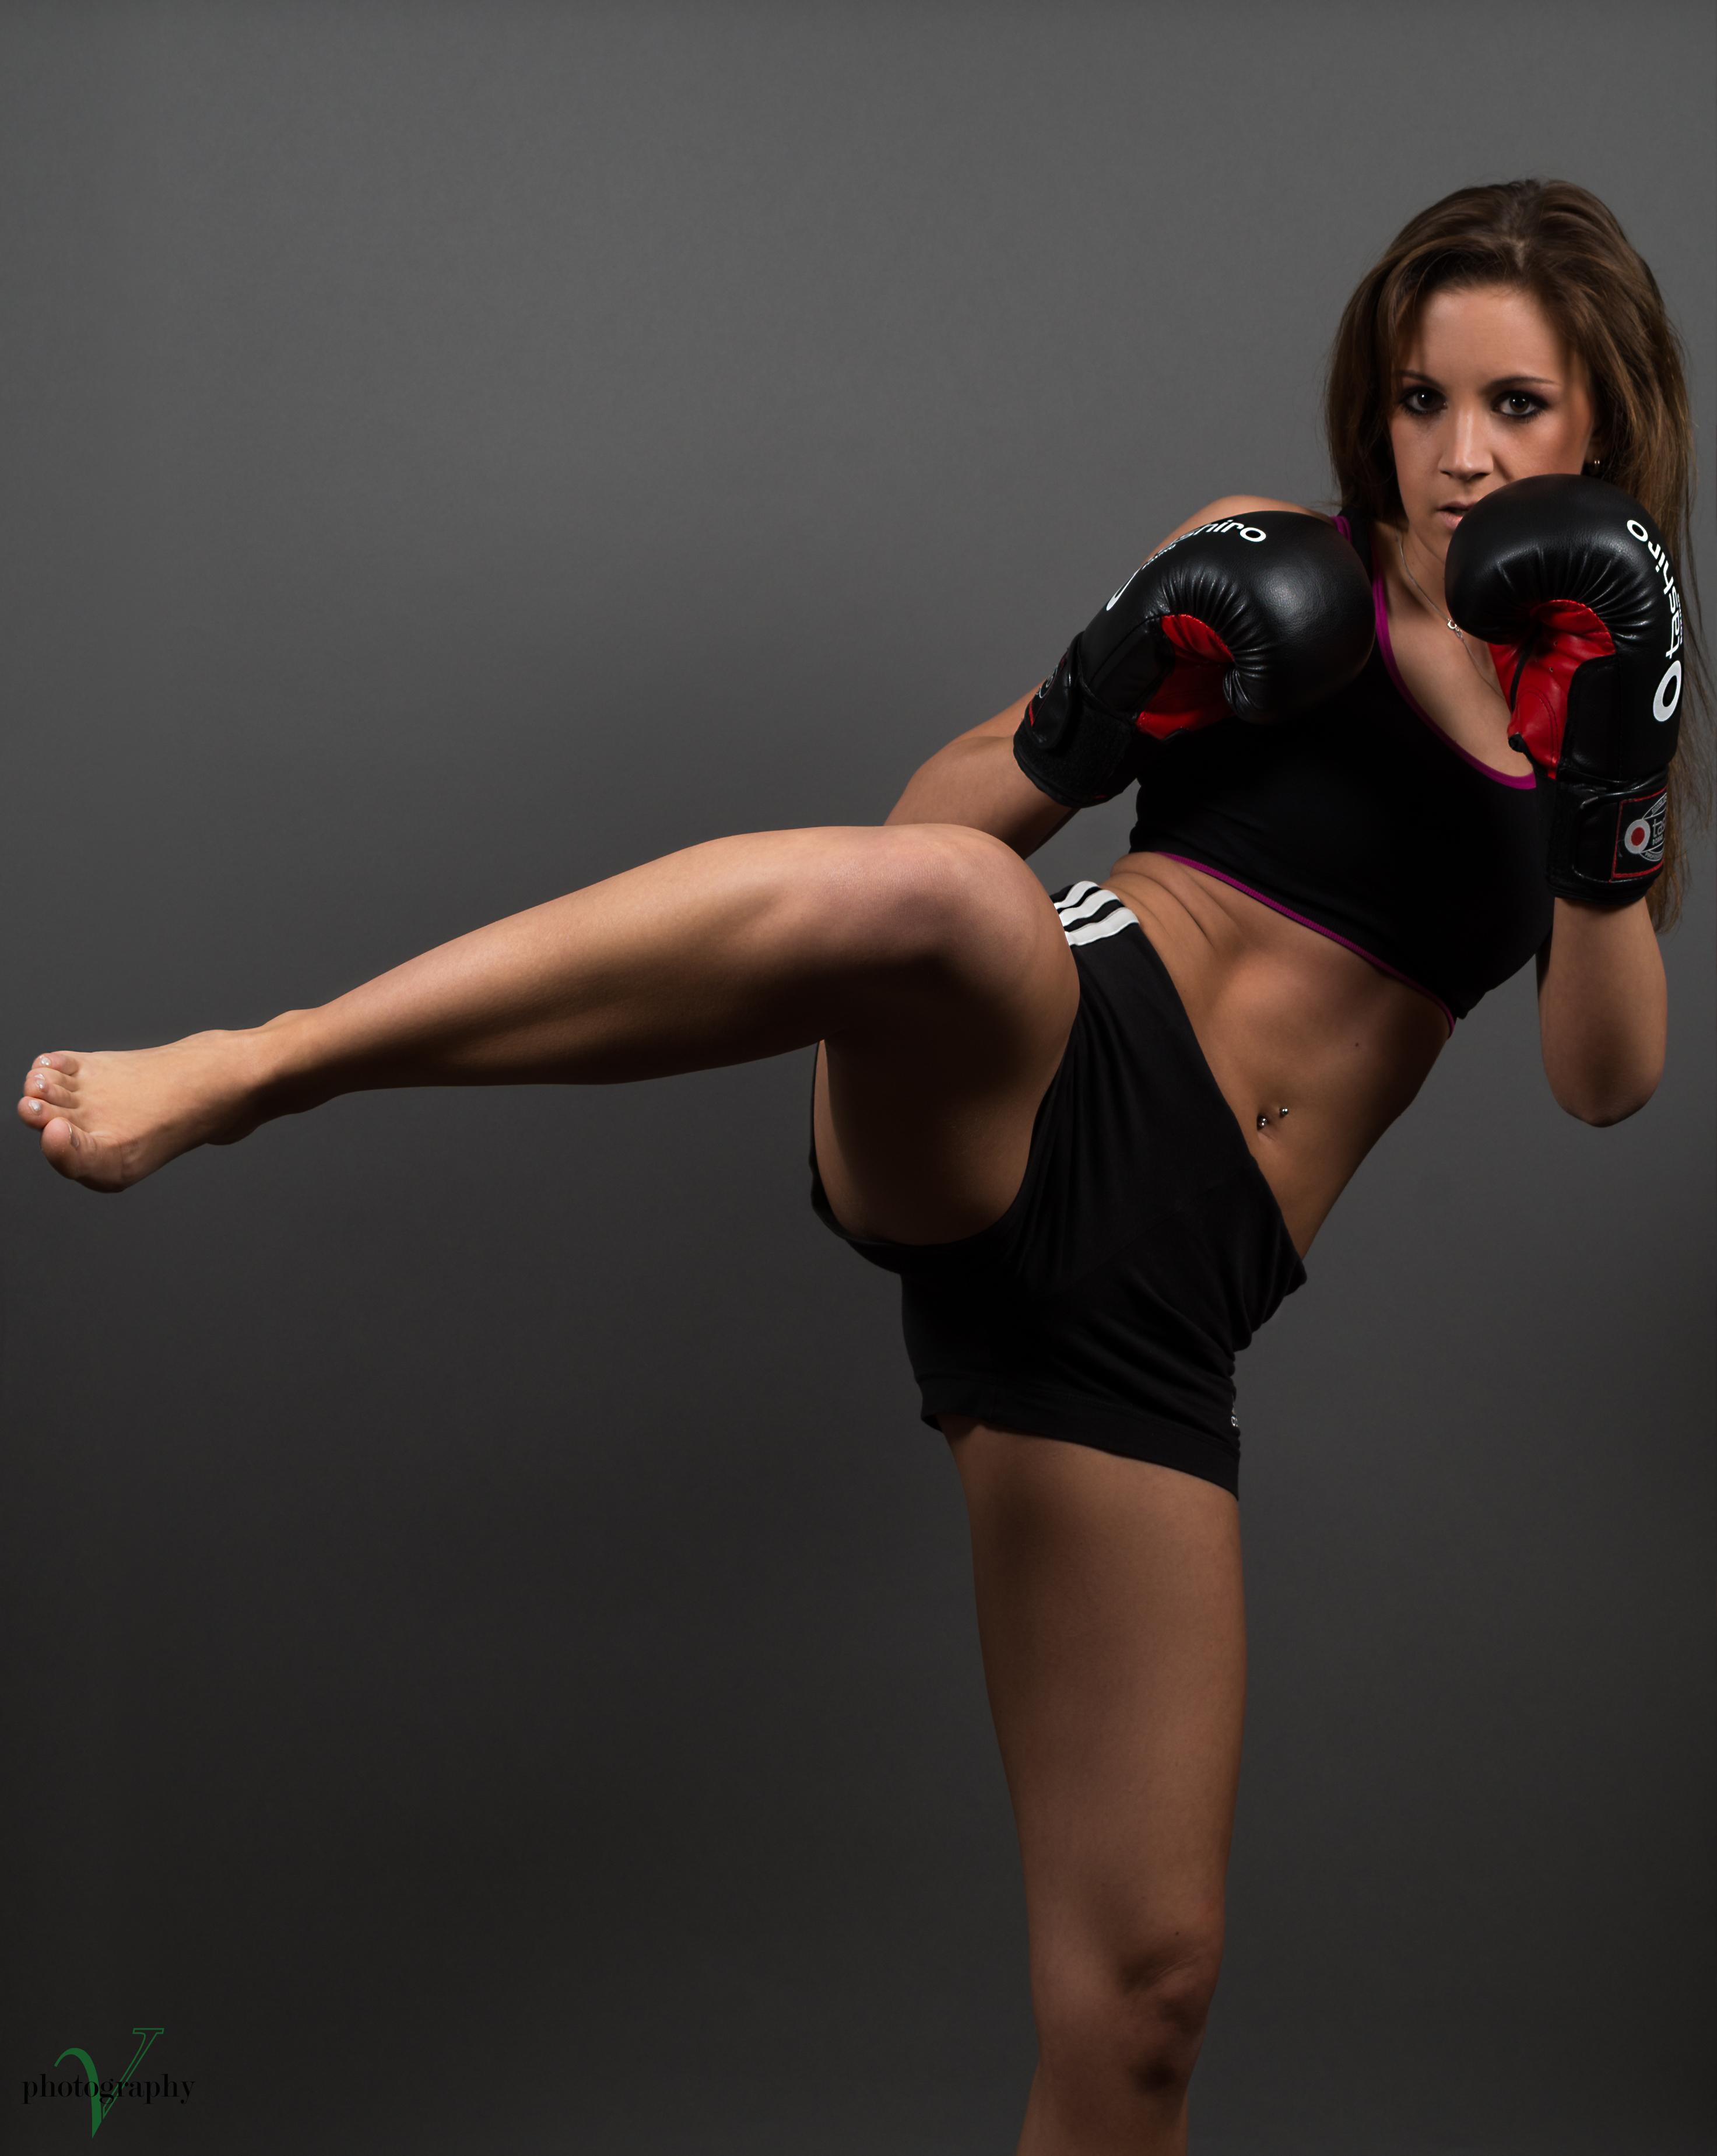 Boxfotos - Sportfotografie - Vatinga Photography